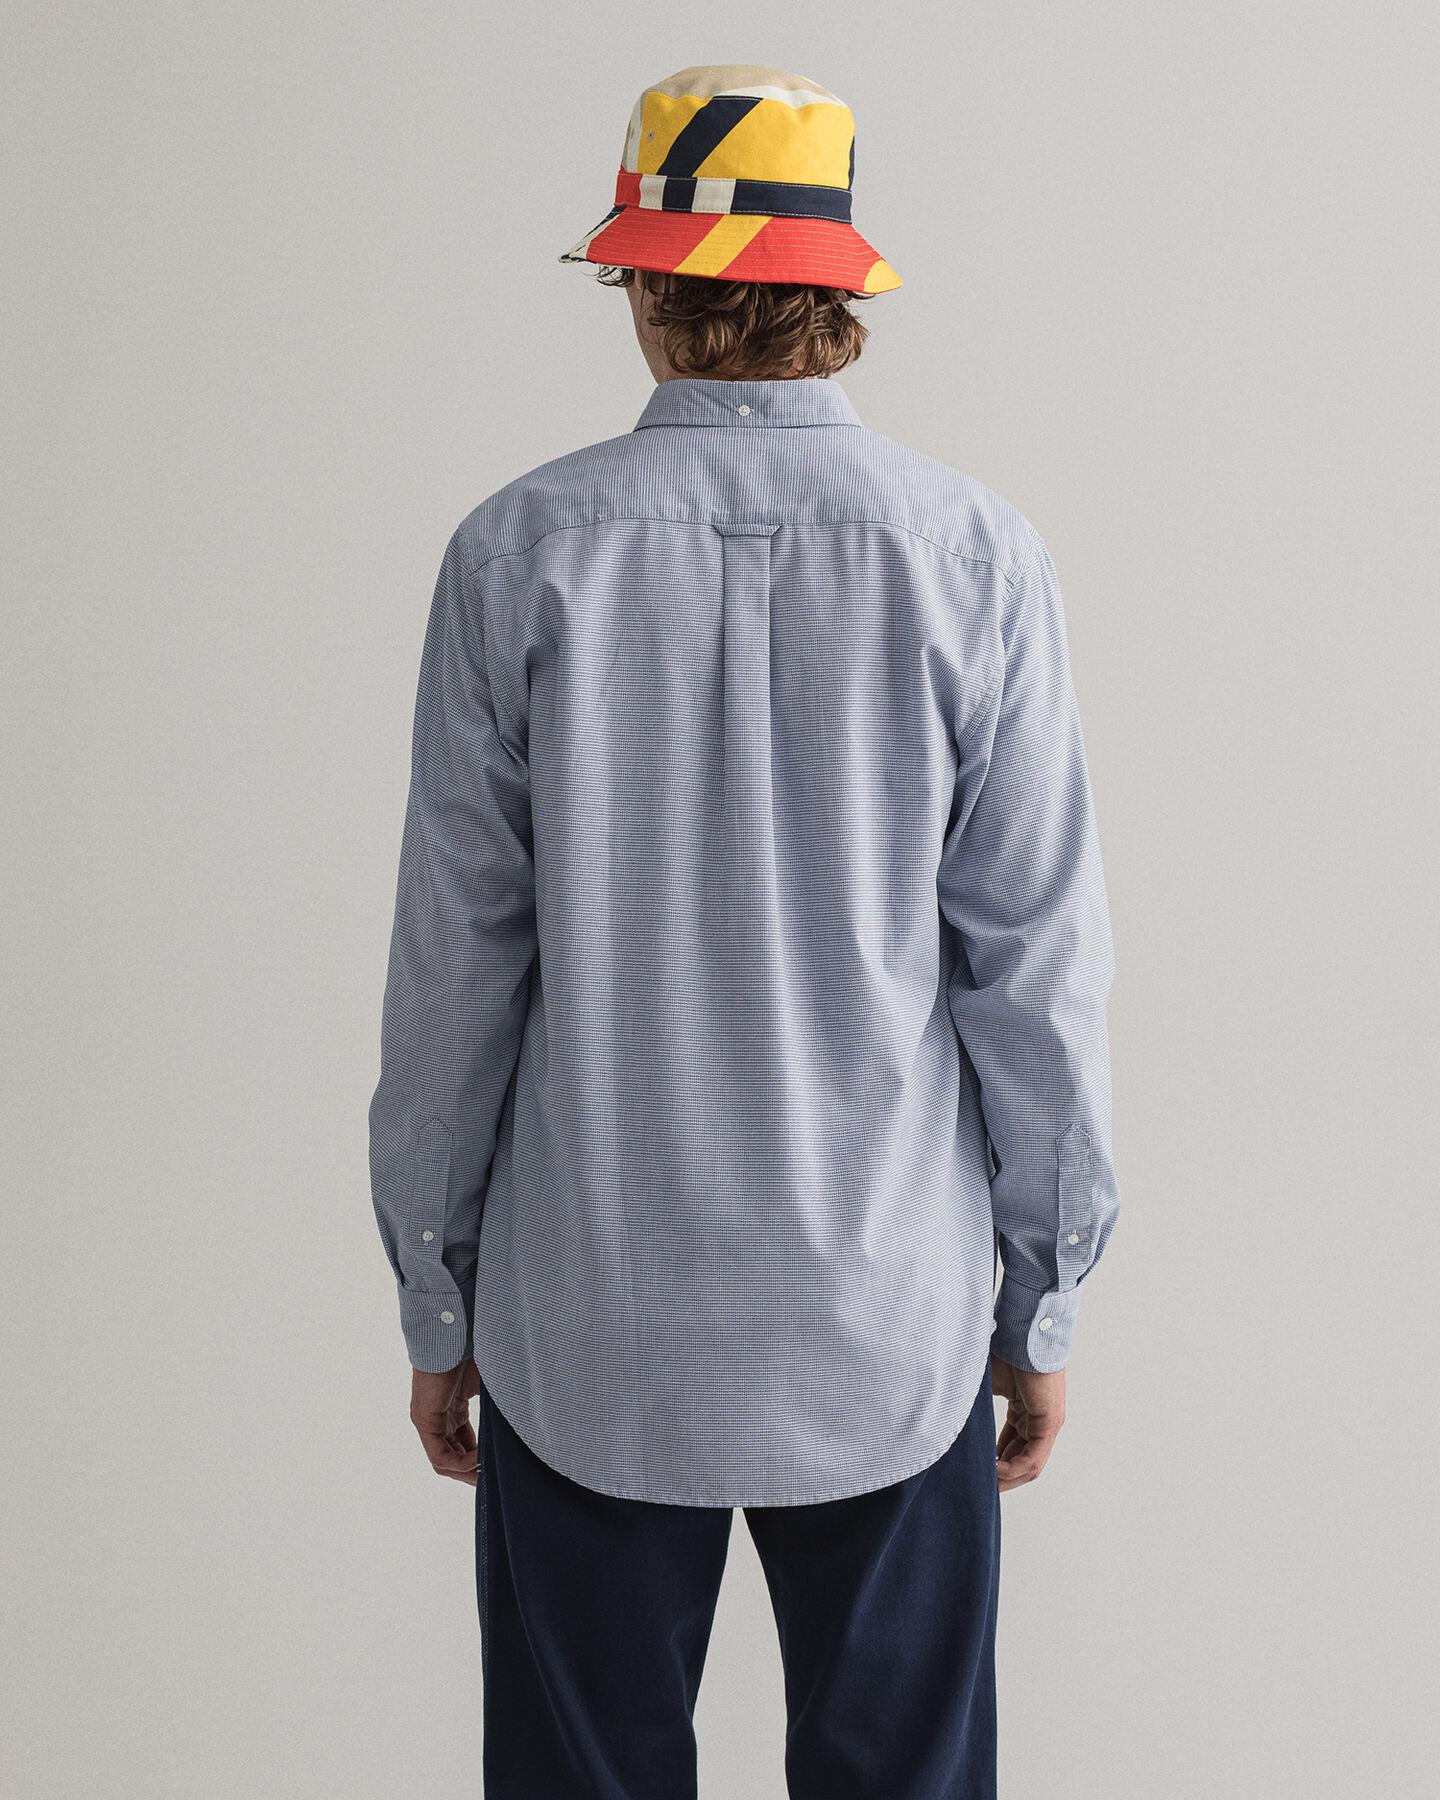 Regular fit Tech Prep™ Royal oxfordskjorta